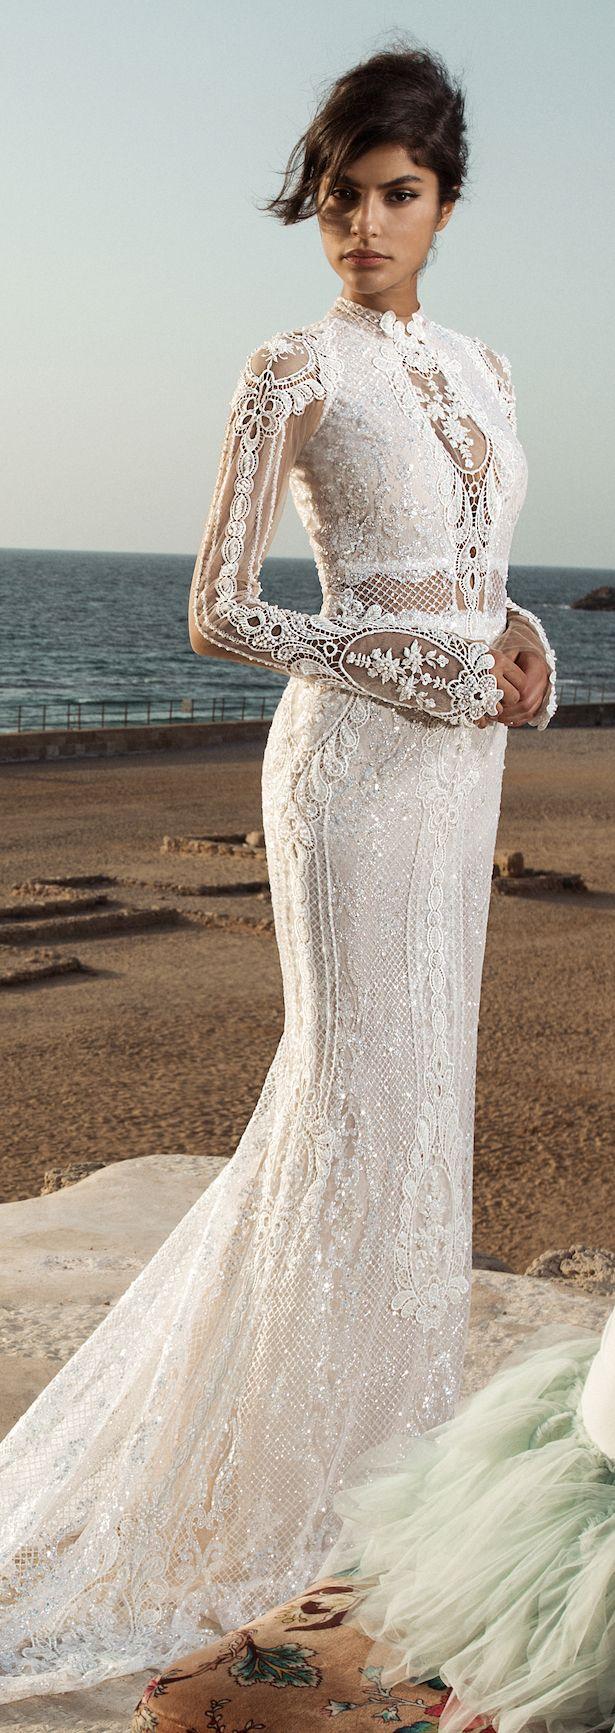 Gala by galia lahav collection no iii wedding dresses